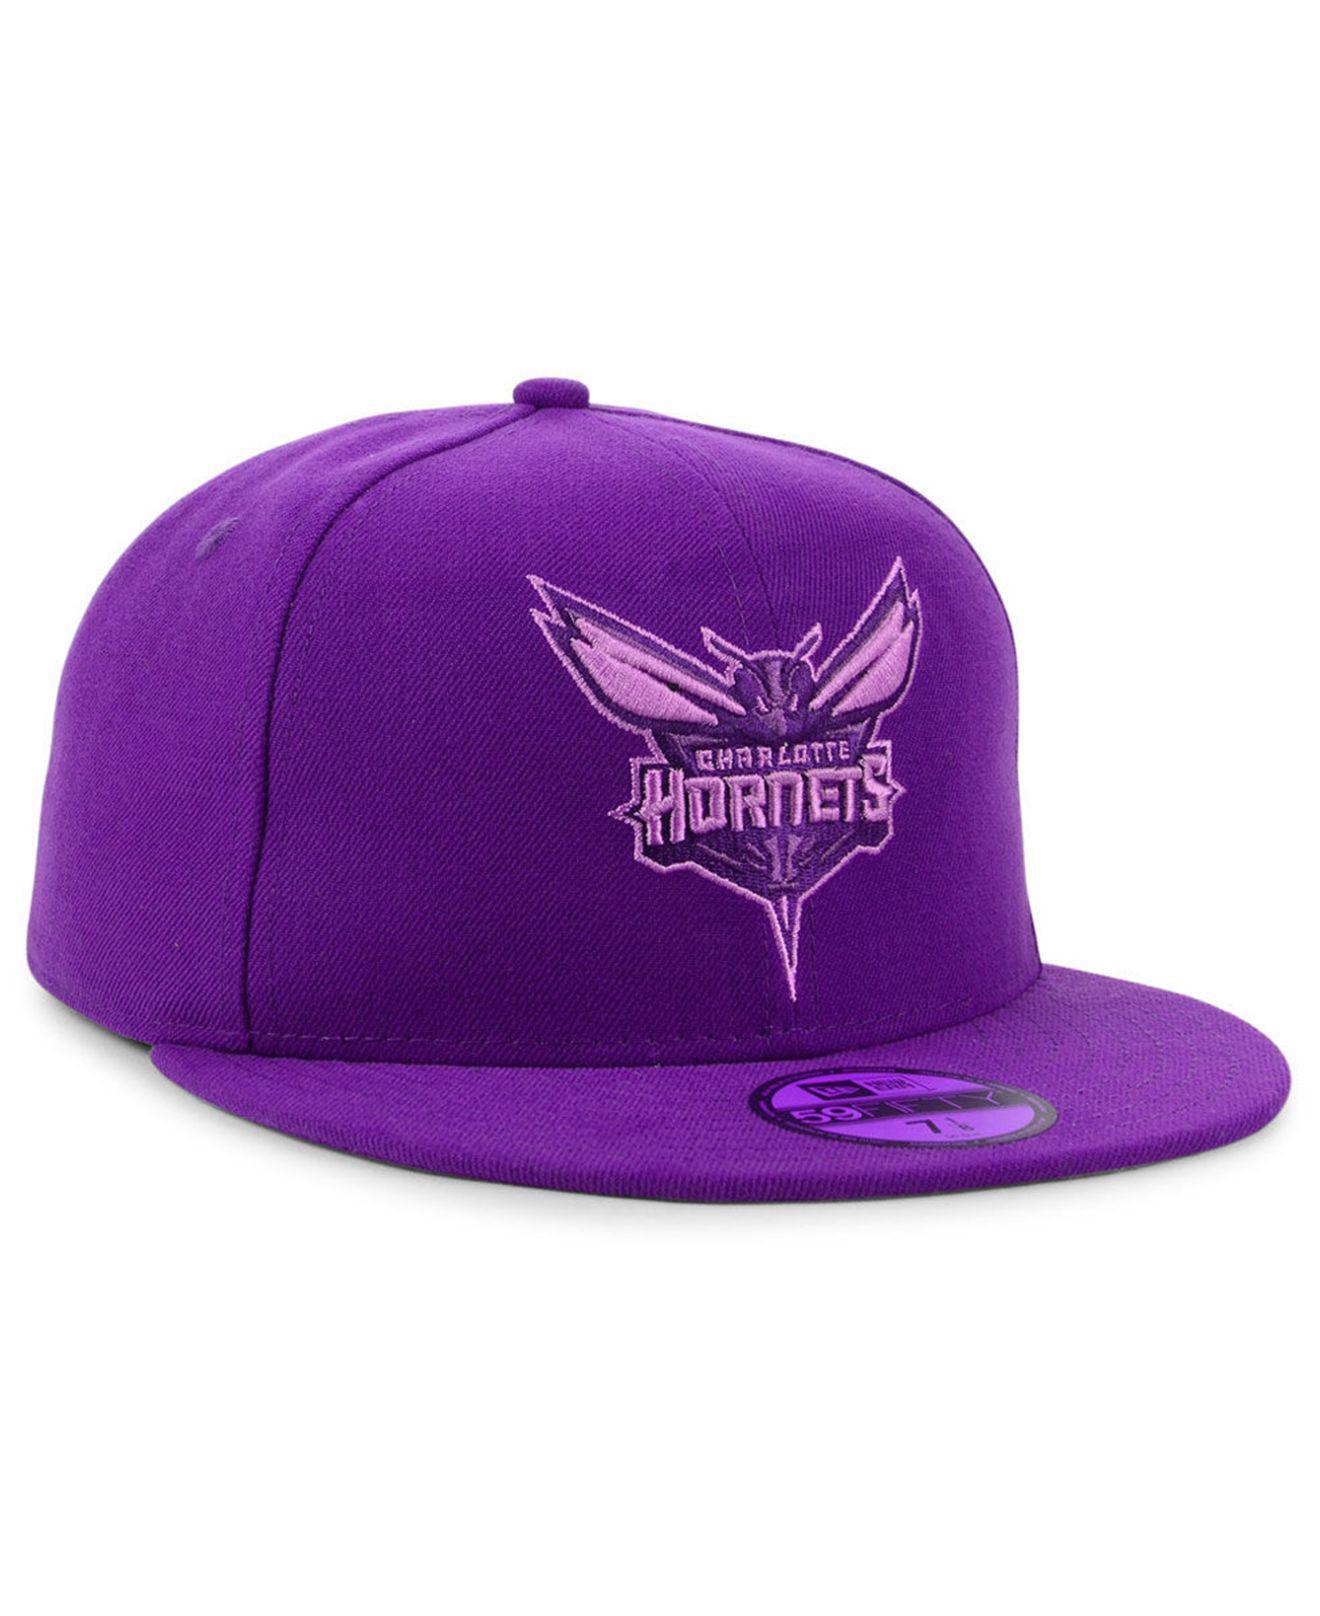 ff1d589194e Lyst - KTZ Charlotte Hornets Color Prism Pack 59fifty Cap in Purple for Men